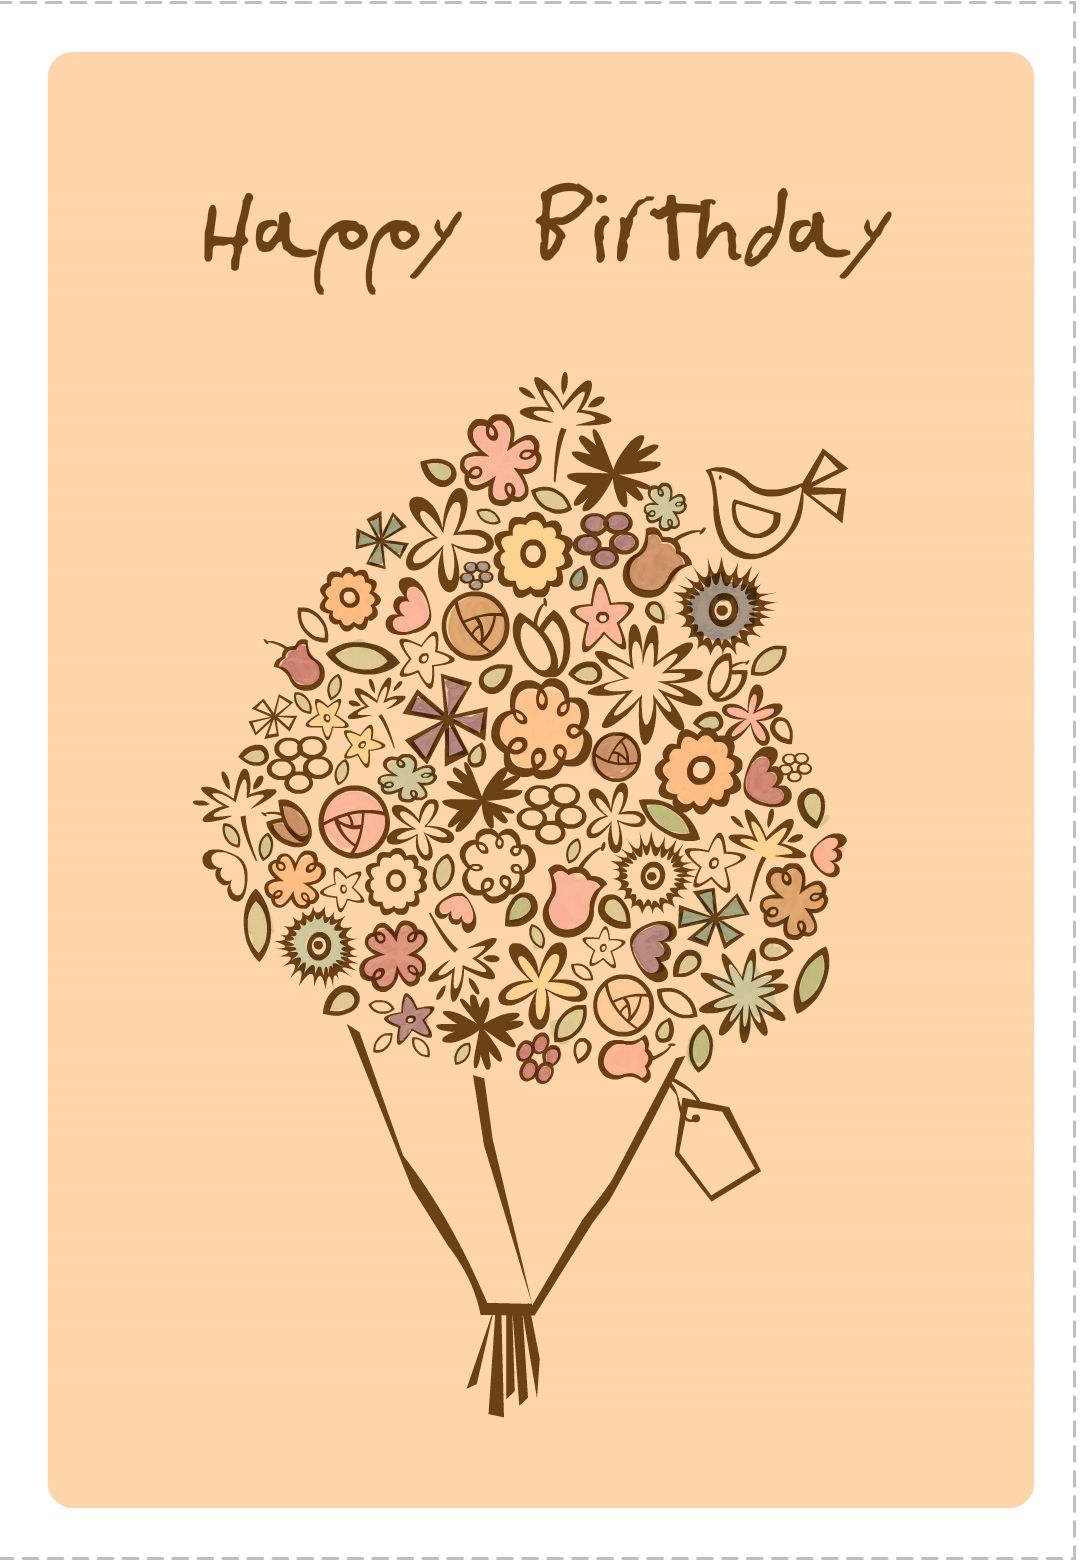 Free Printable Happy Birthday Bouquet Greeting Card